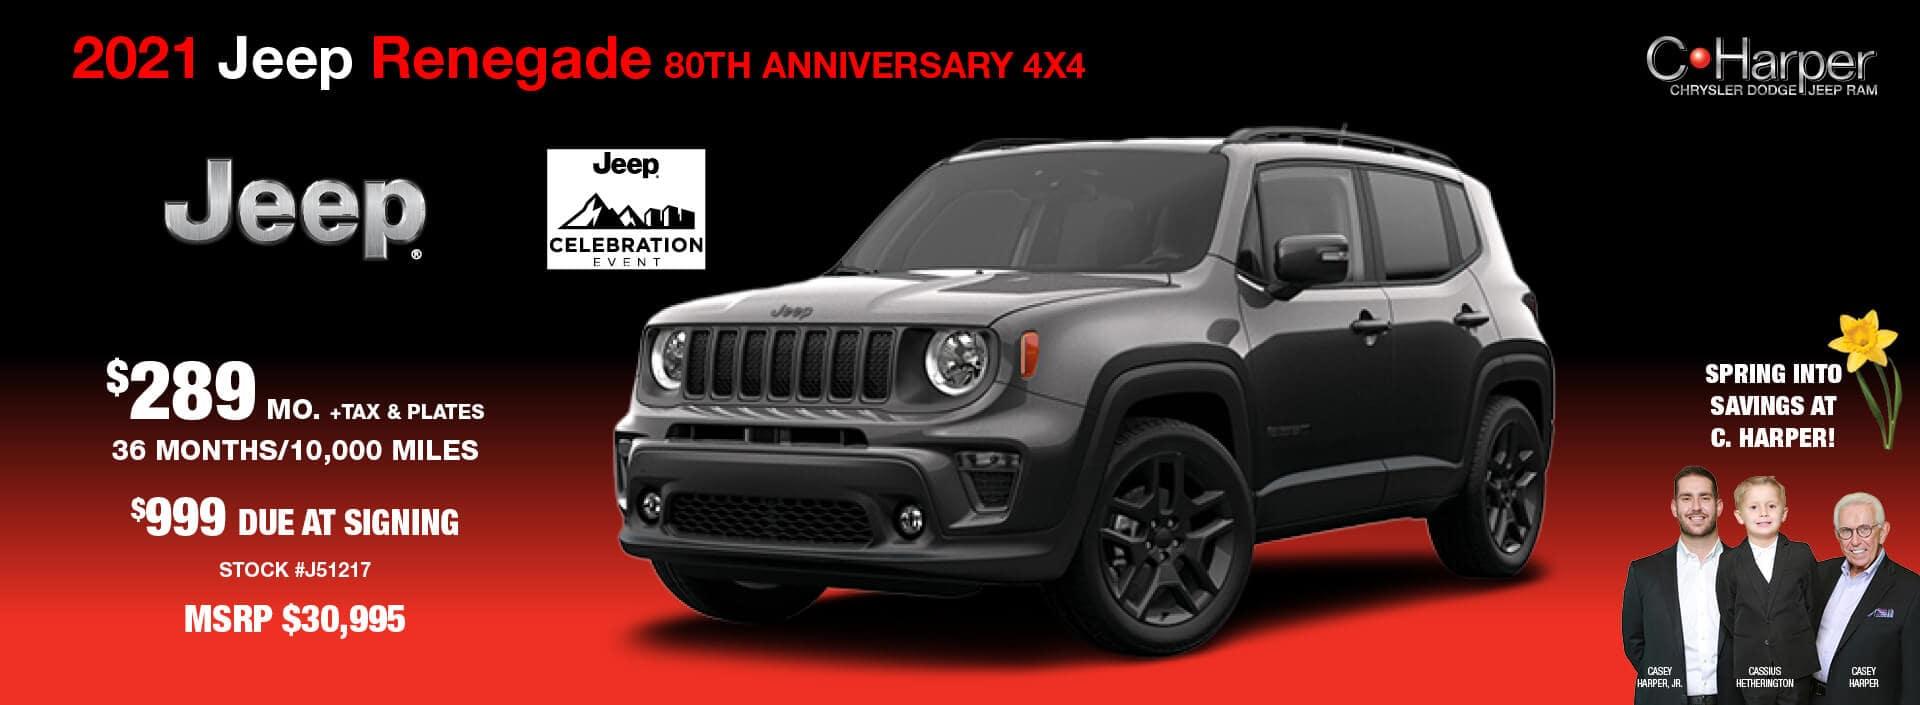 2021 Jeep Renegade 80th Anniversary 4X4